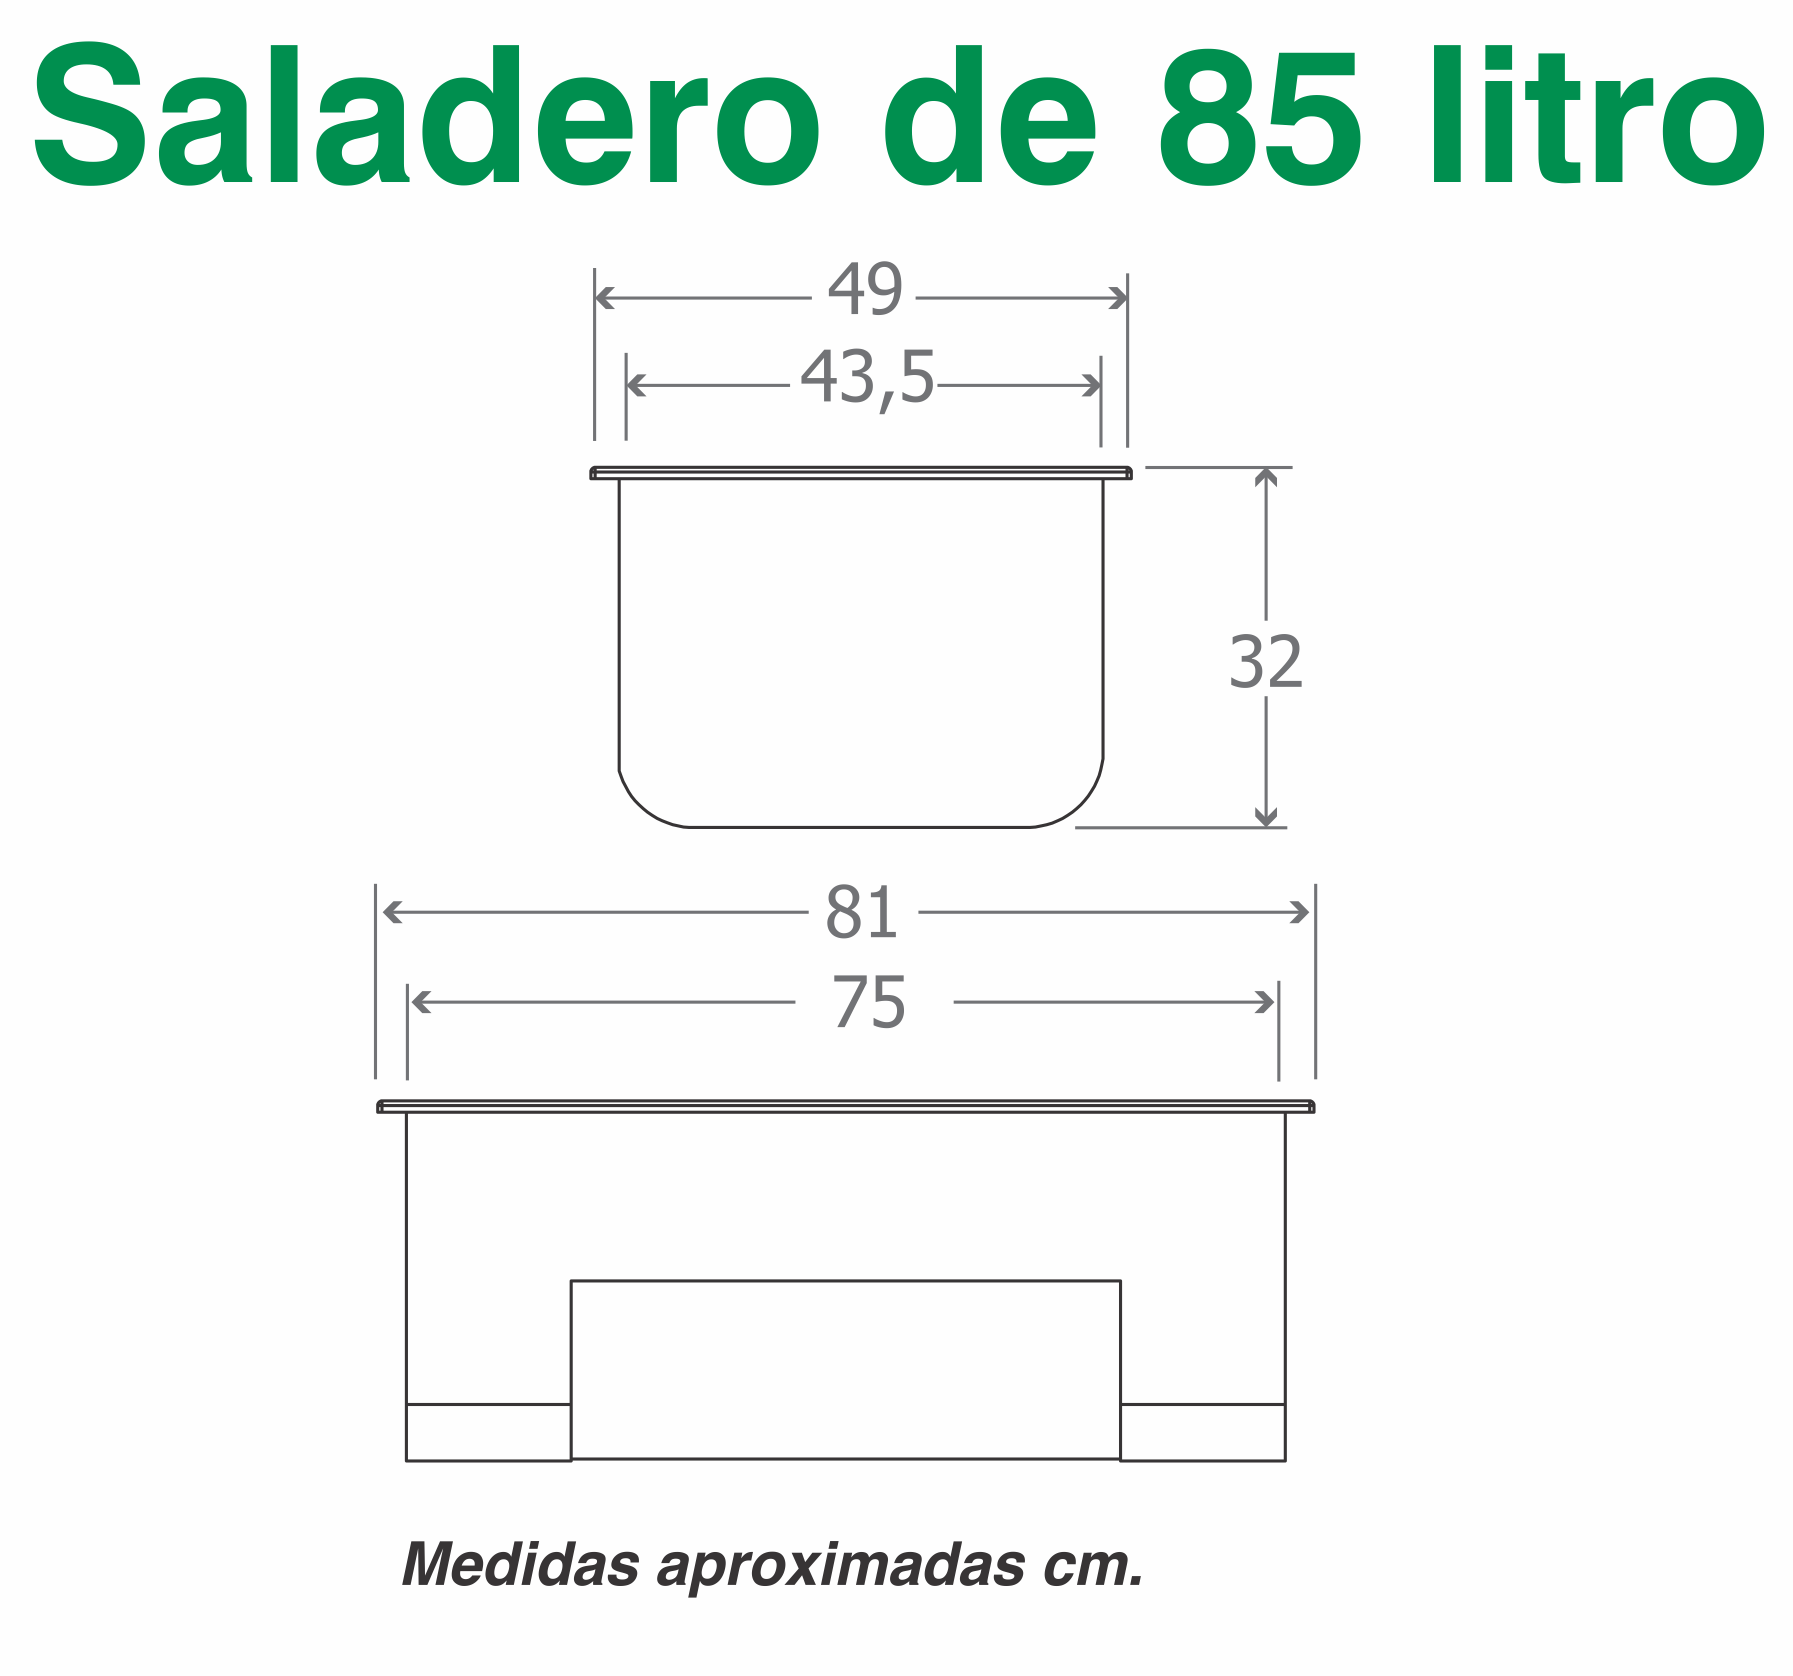 Saladero 85 litros medidas